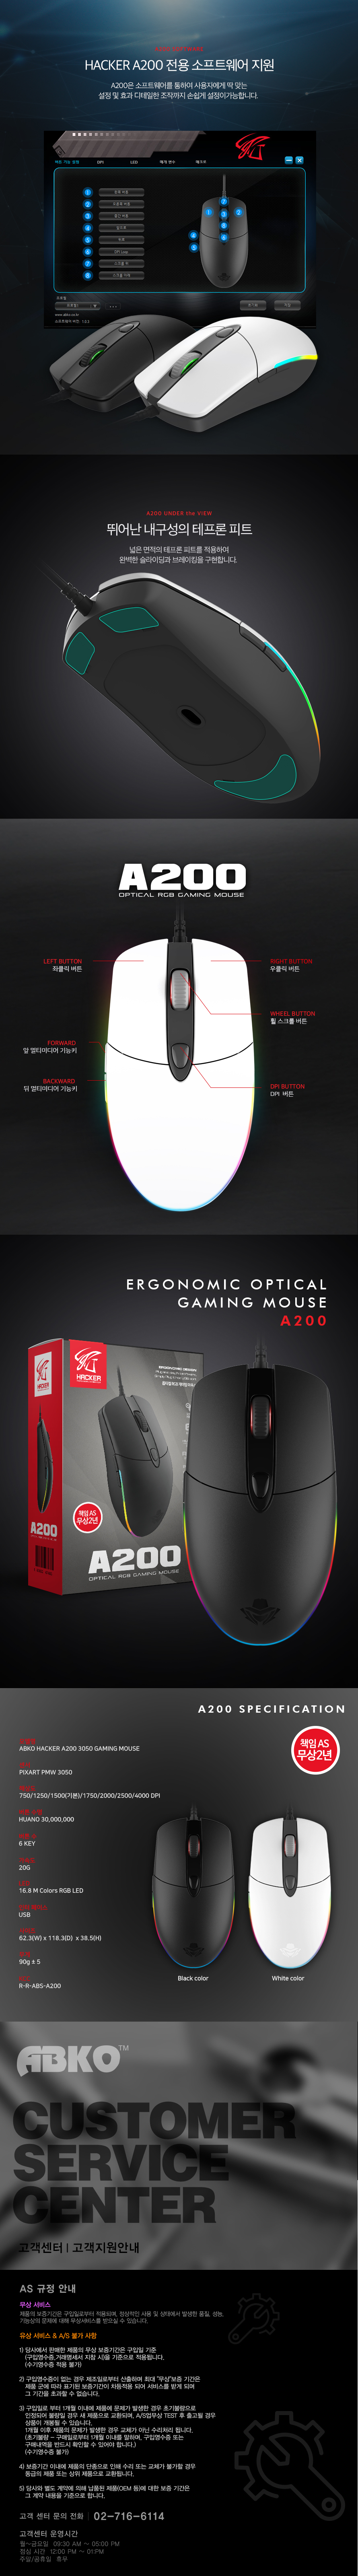 ABKO HACKER A200 3050 RGB 게이밍 마우스(화이트)